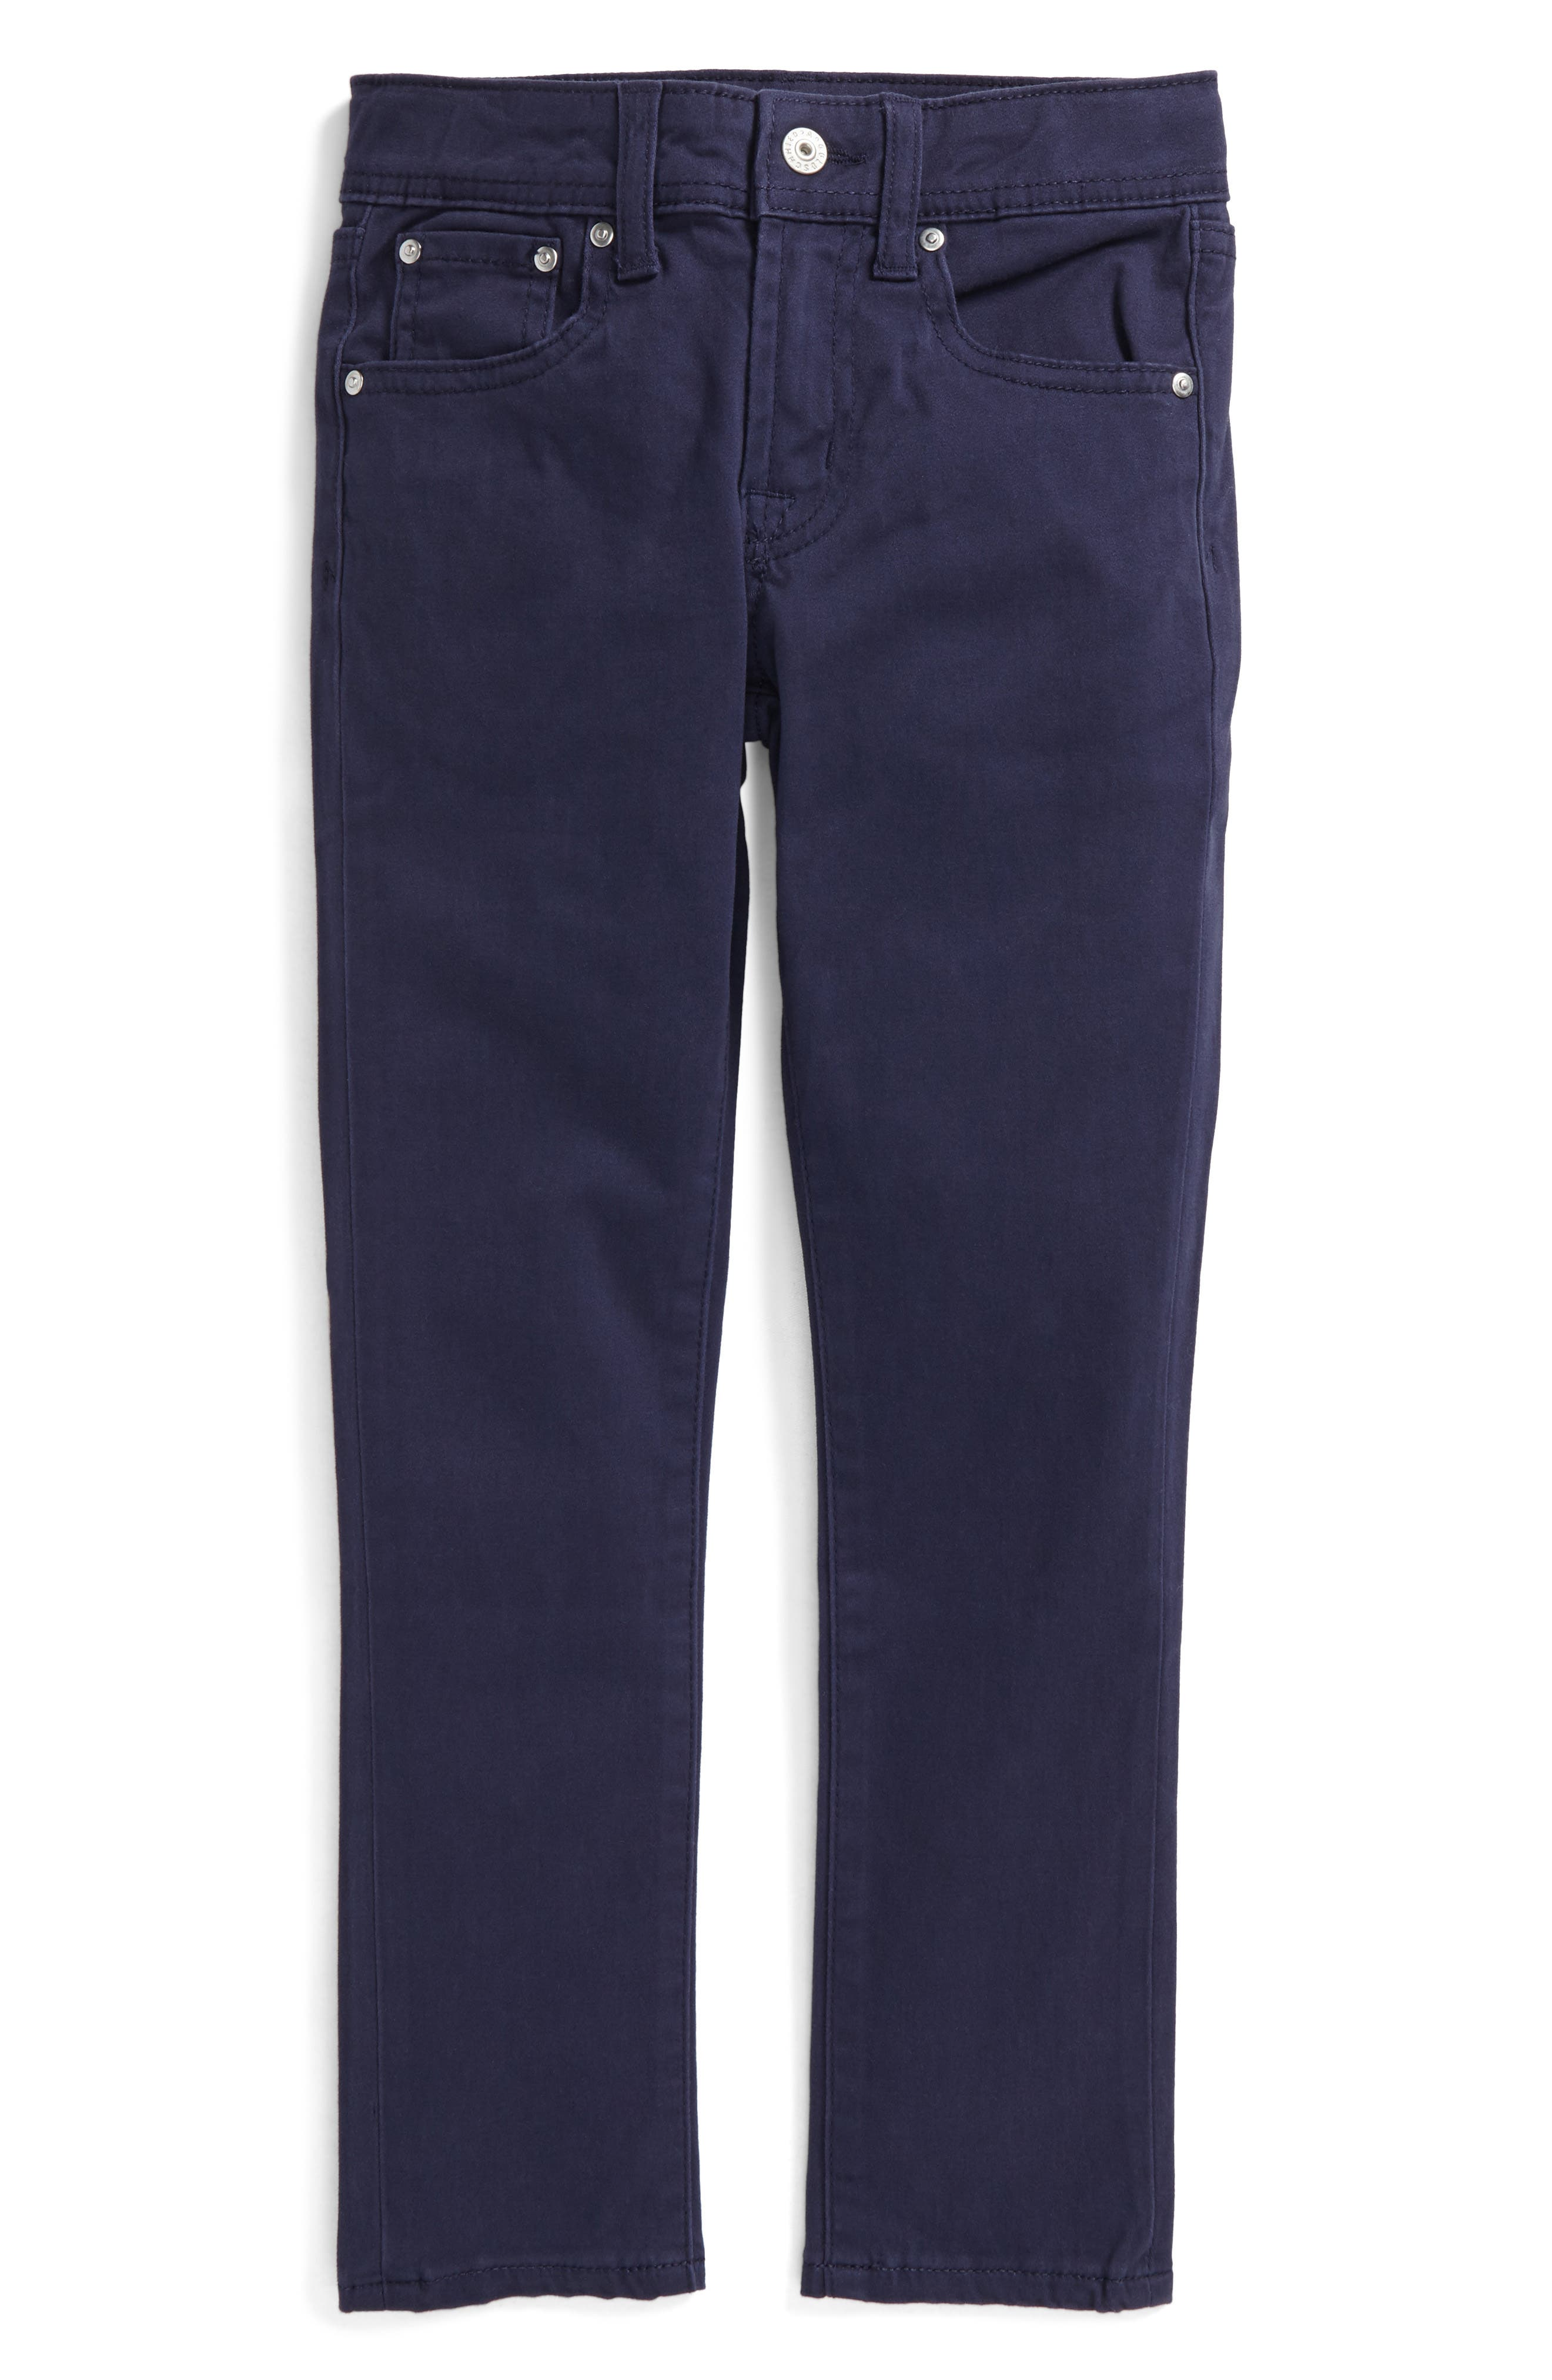 ag adriano goldschmied kids The Kingston Luxe Slim Jeans (Toddler Boys & Little Boys)